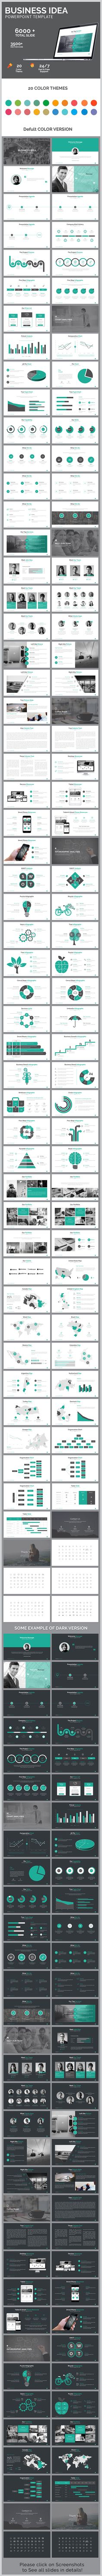 Business Idea Powerpoint Presentation Template — Powerpoint PPTX #business presentation #powerpoint • Download ➝ https://graphicriver.net/item/business-idea-powerpoint-presentation-template/19162663?ref=pxcr